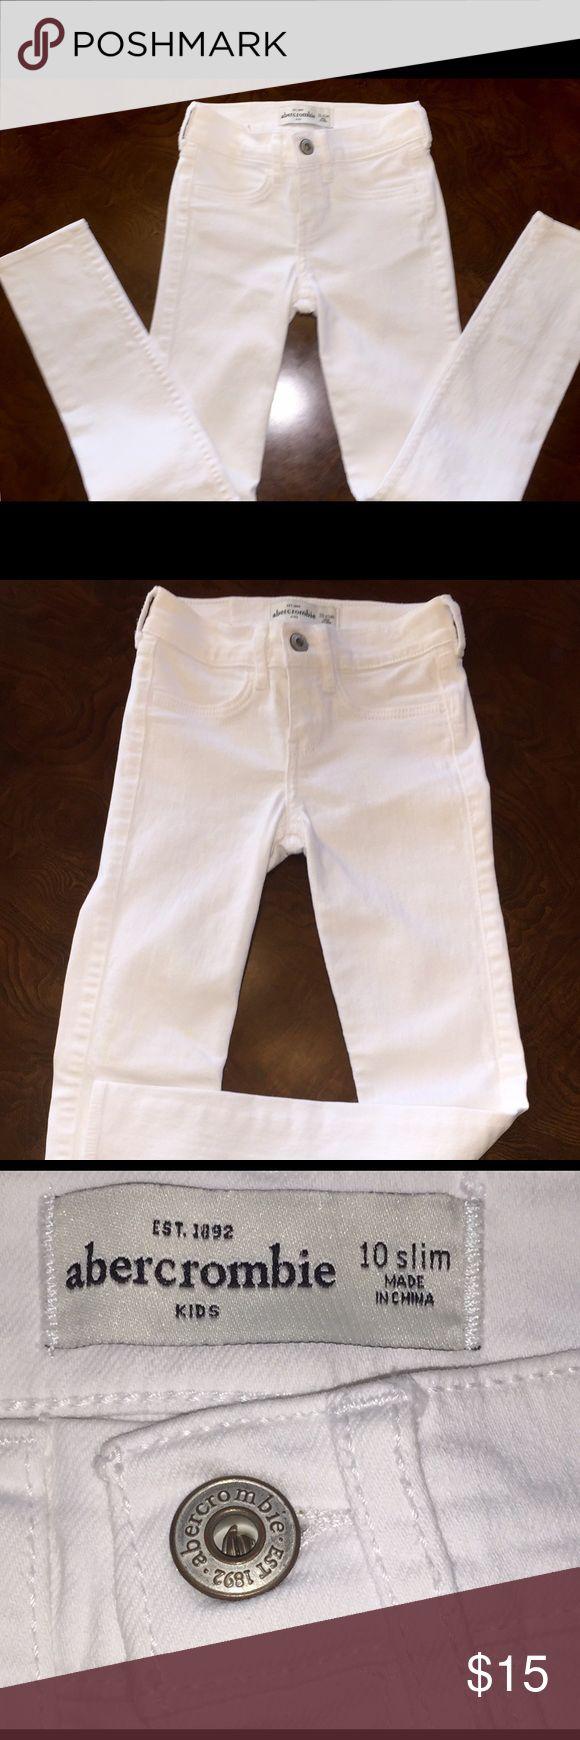 Girls Abercrombie Kids White Denim Jeans-10 Slim Like NEW white Denim Jeans 10 slim by Abercrombie Kids  WORN 1 time only Abercrombie Kids Bottoms Casual